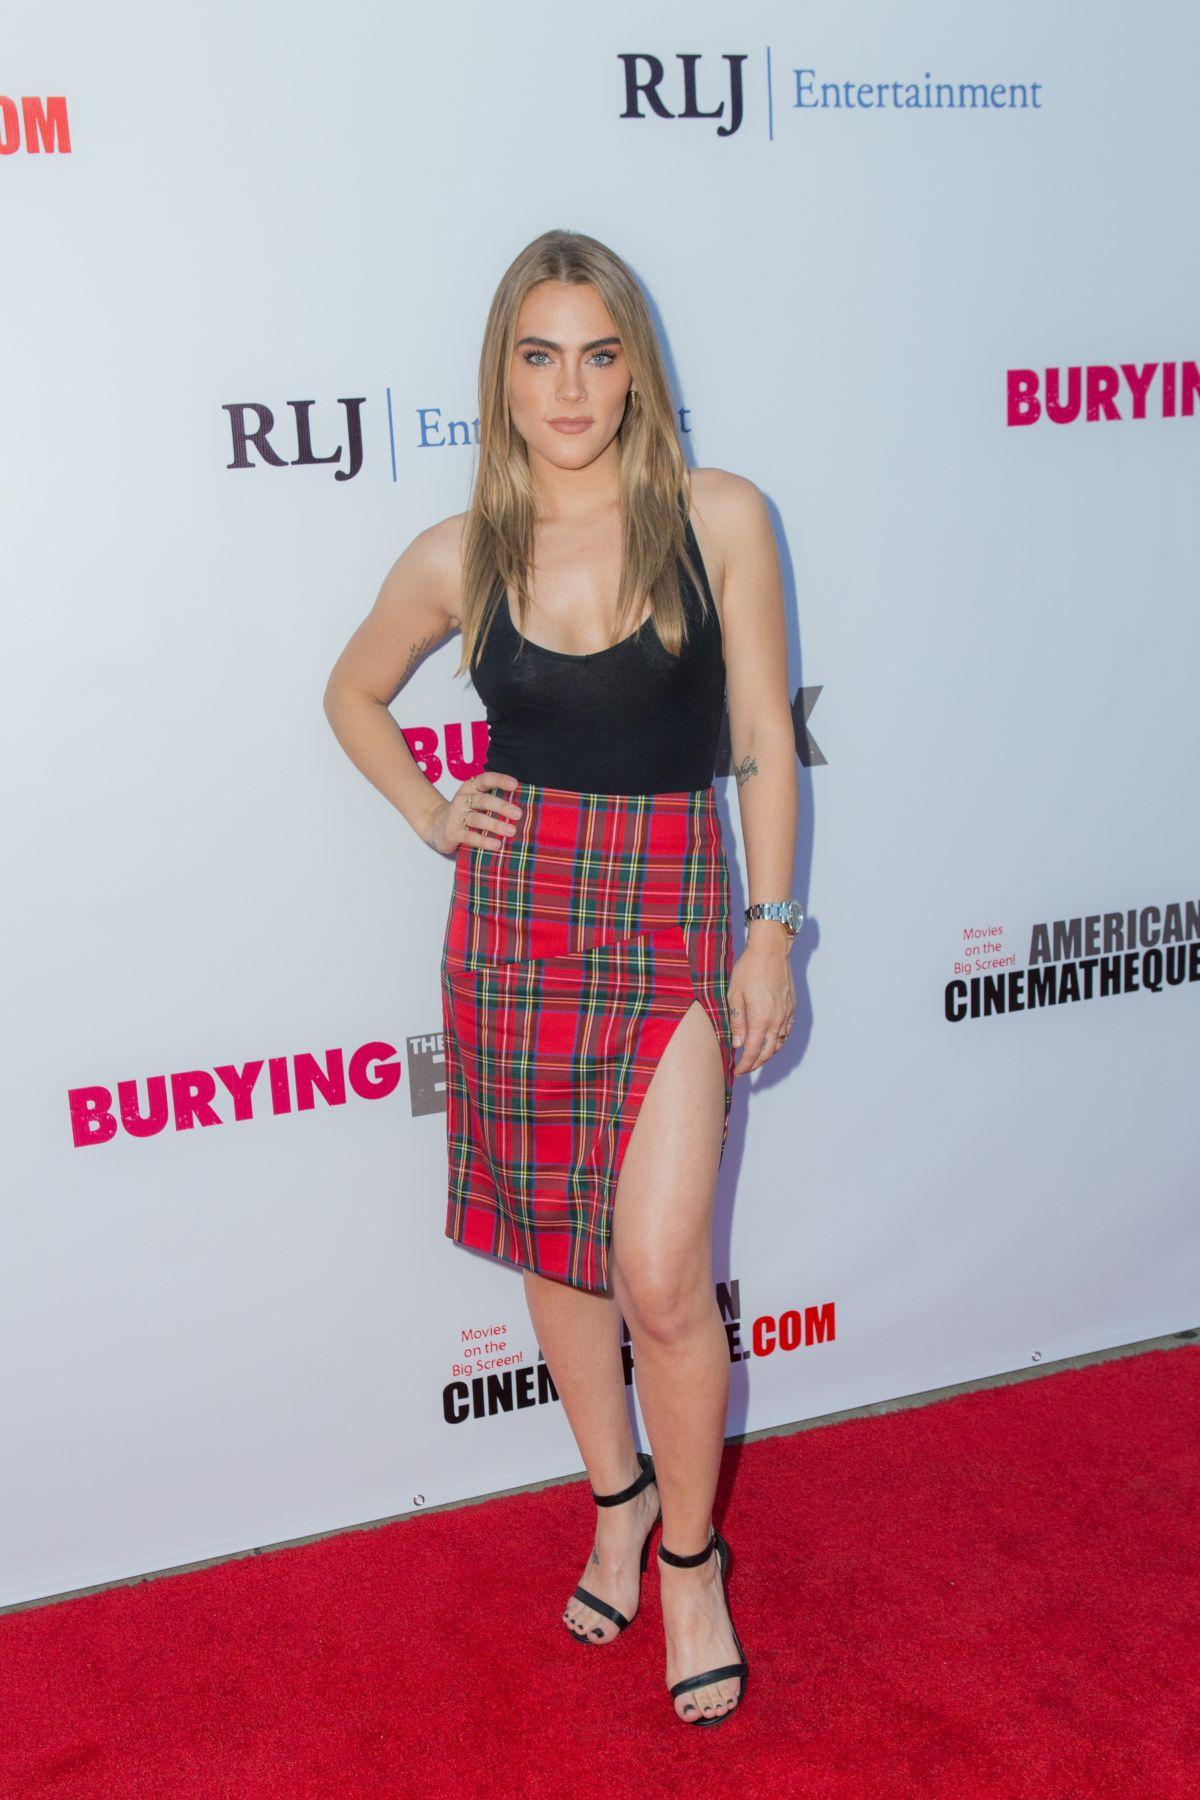 NADICE CROCKER at Burying the Ex Premiere in Hollywood